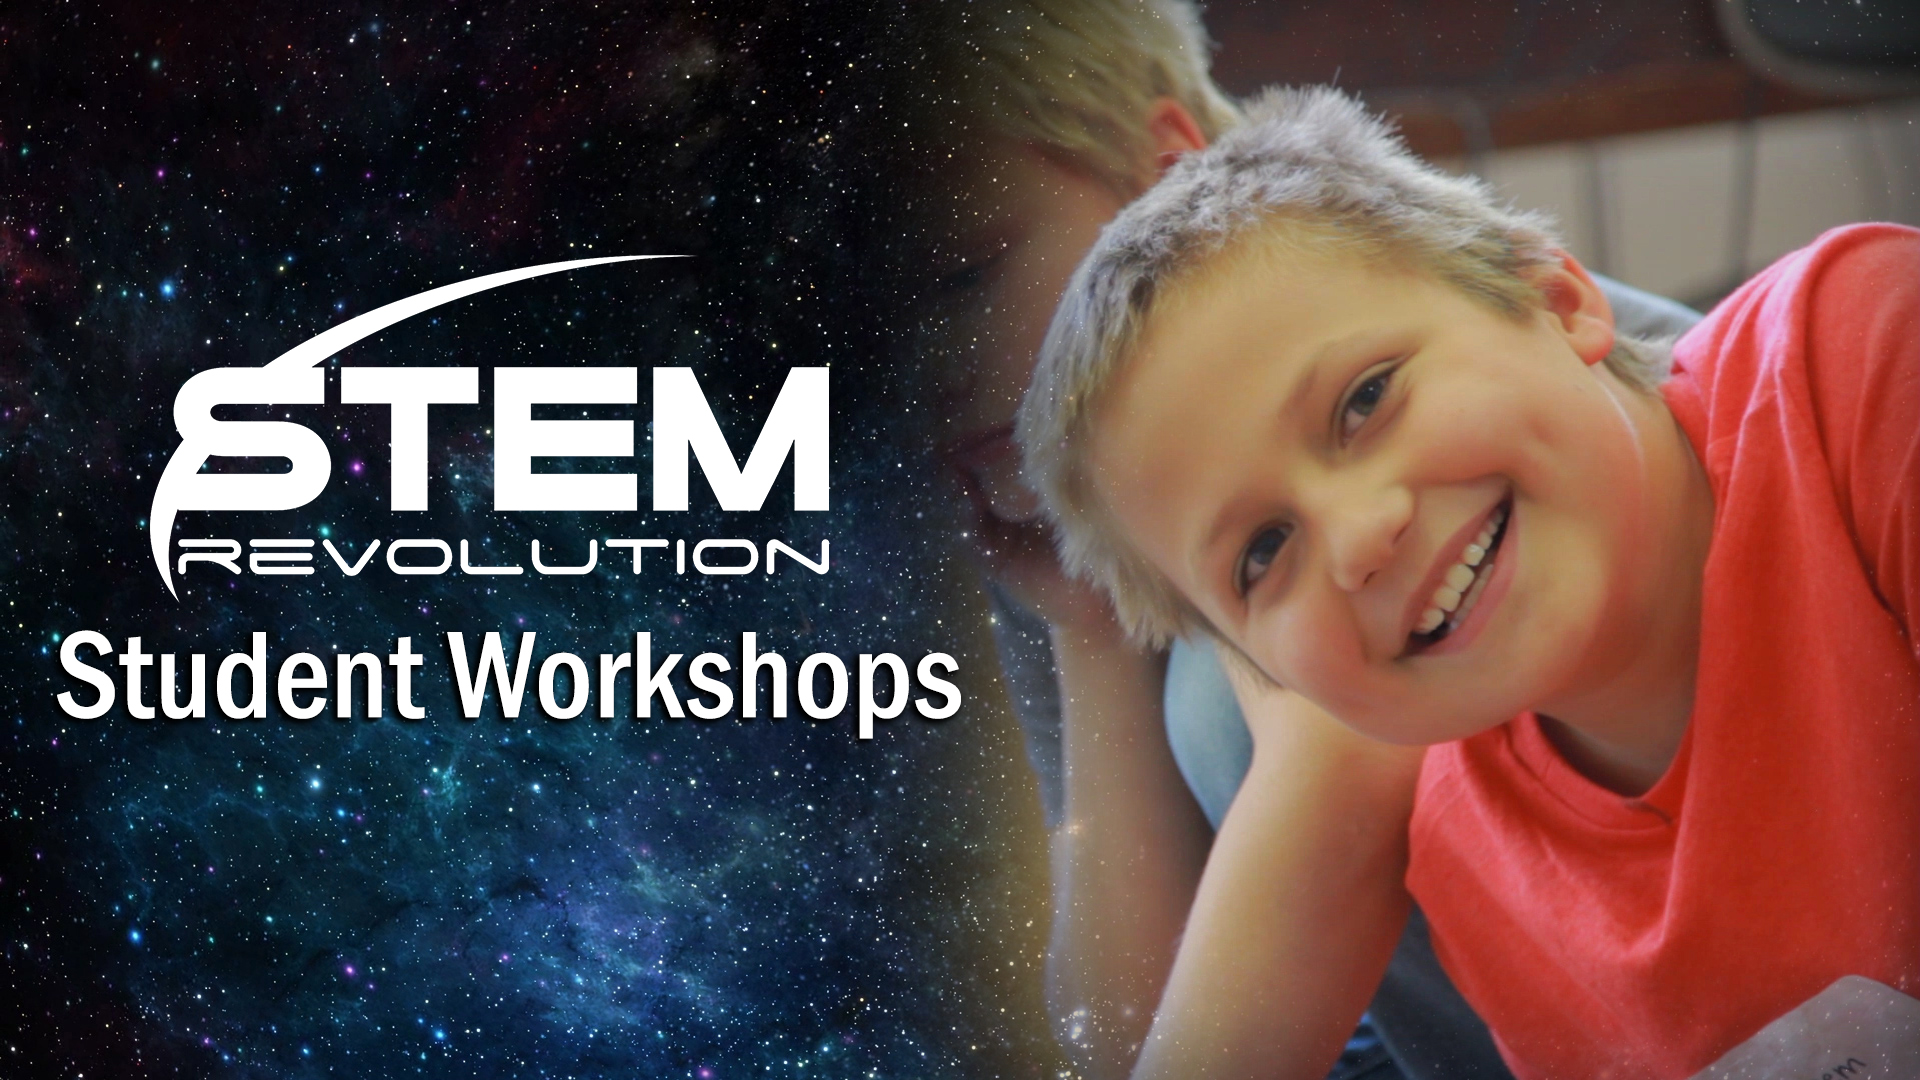 STEM Revolution - Student Workshops